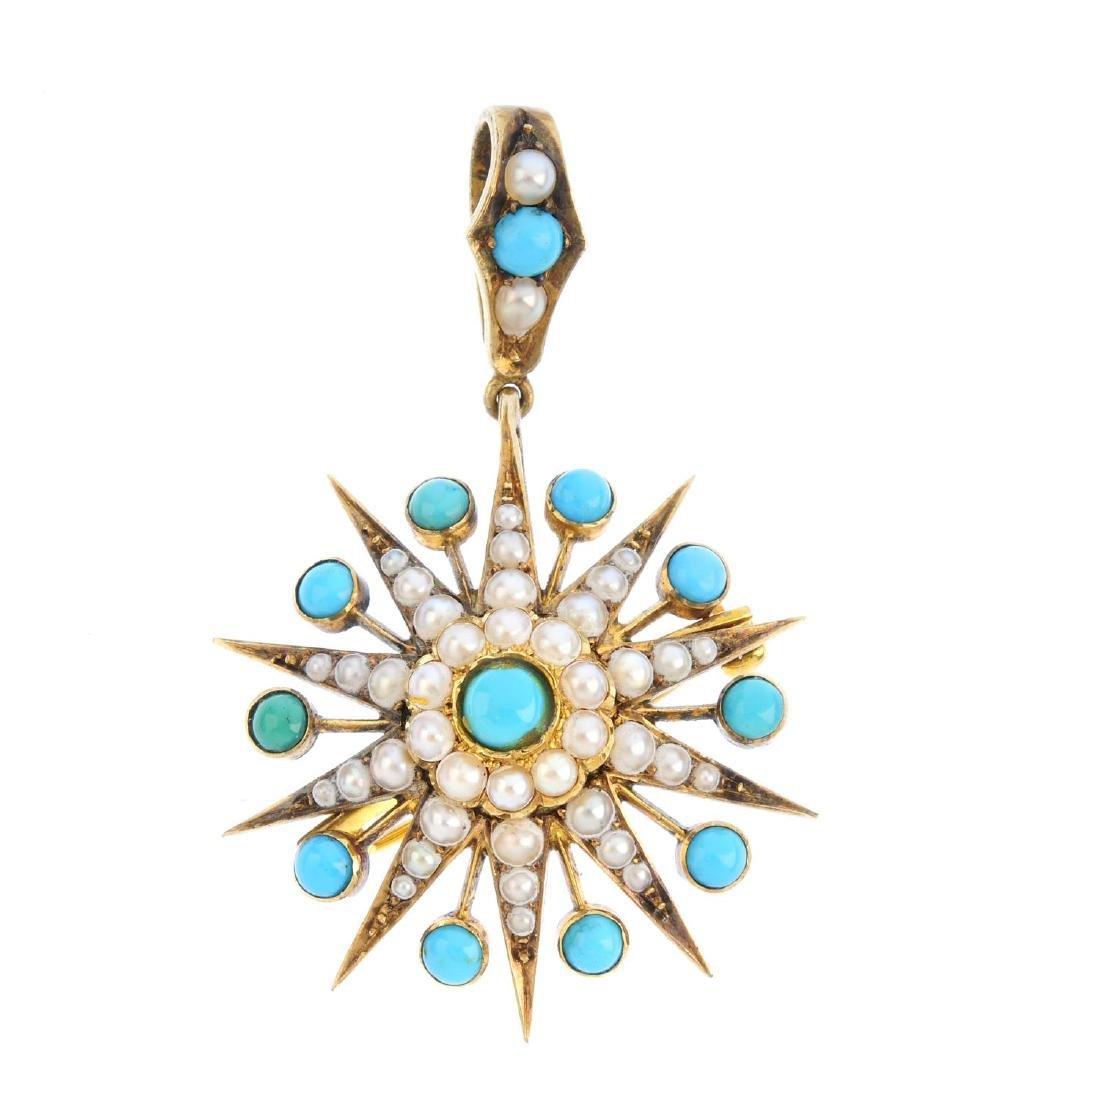 A late Victorian 15ct gold gem-set pendant. The split